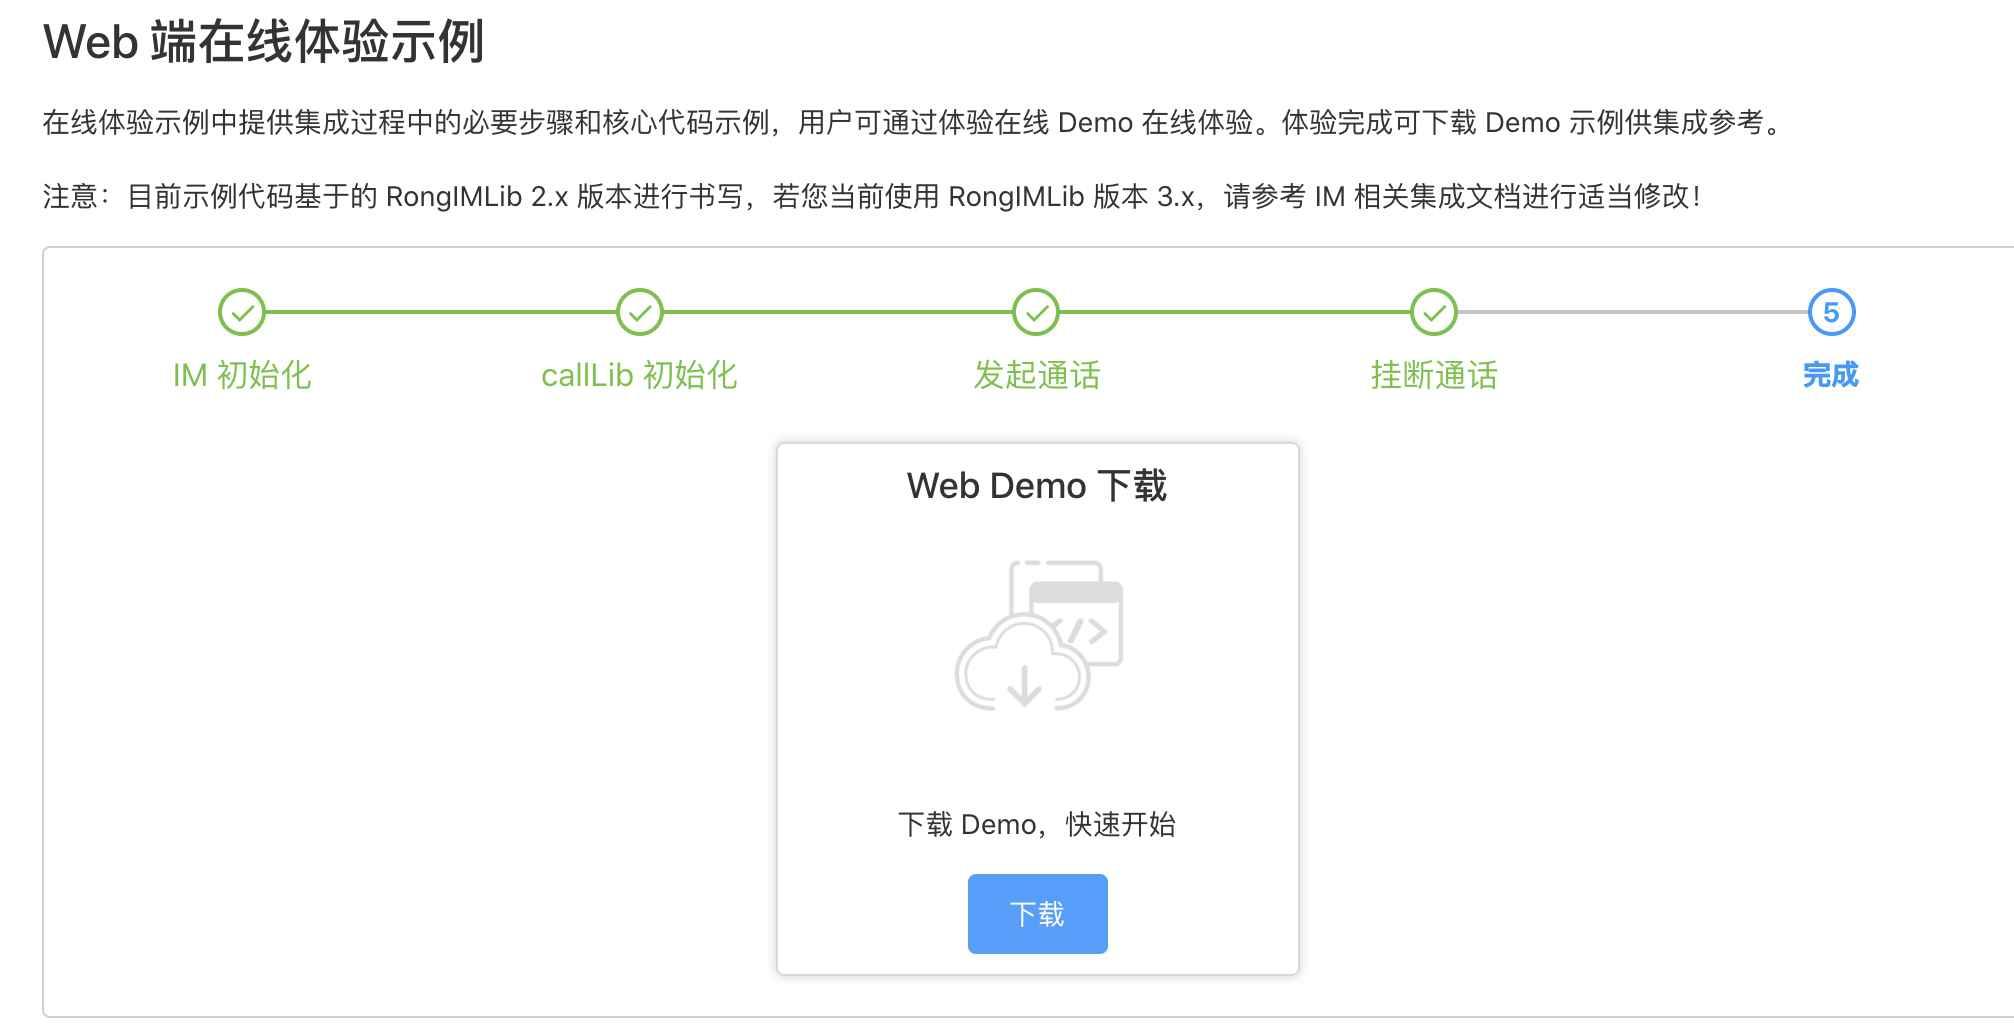 https://wyh29.gitee.io/image/calllib-demo.jpeg